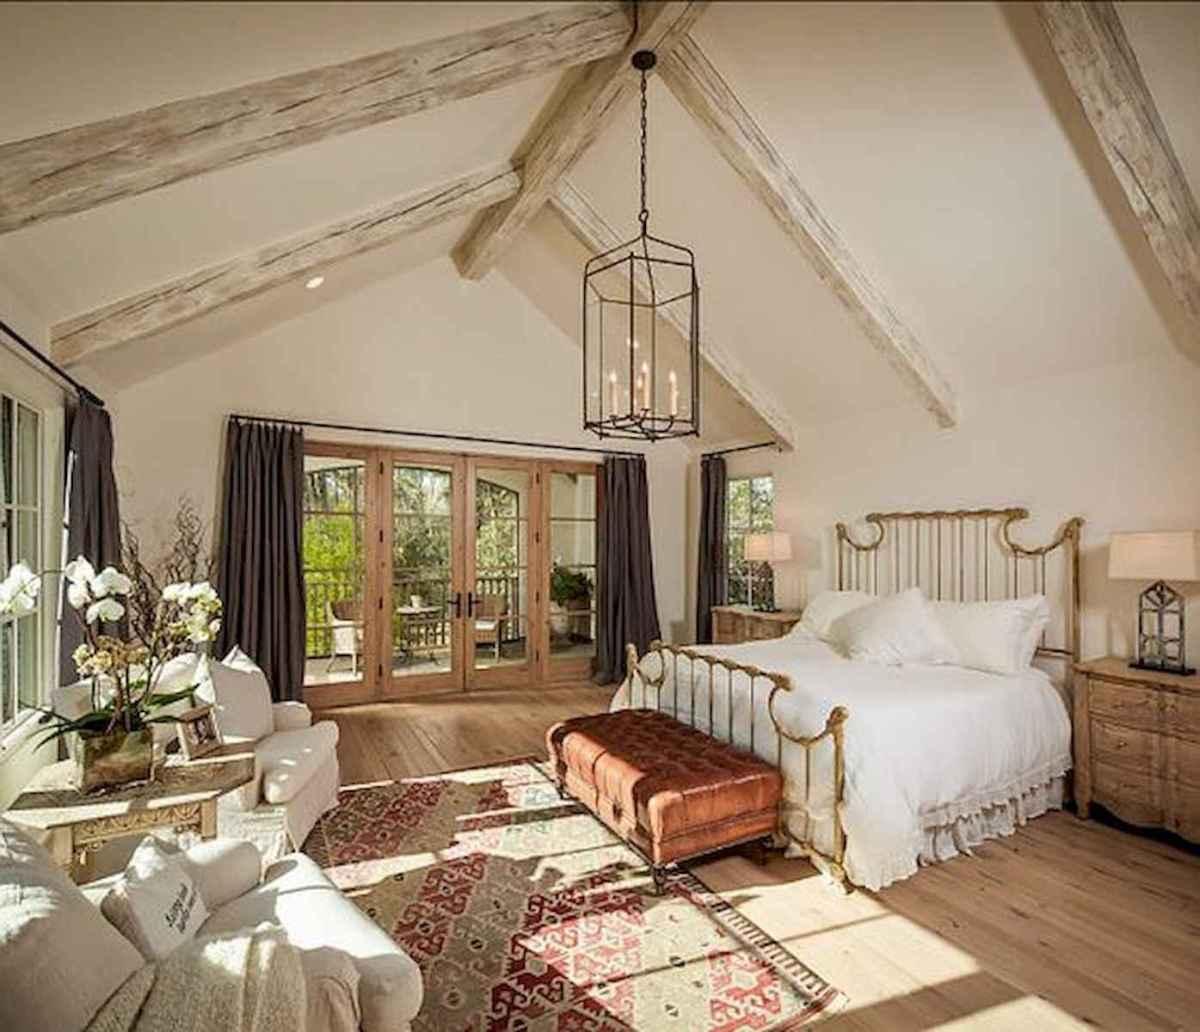 120 Awesome Farmhouse Master Bedroom Decor Ideas (26)